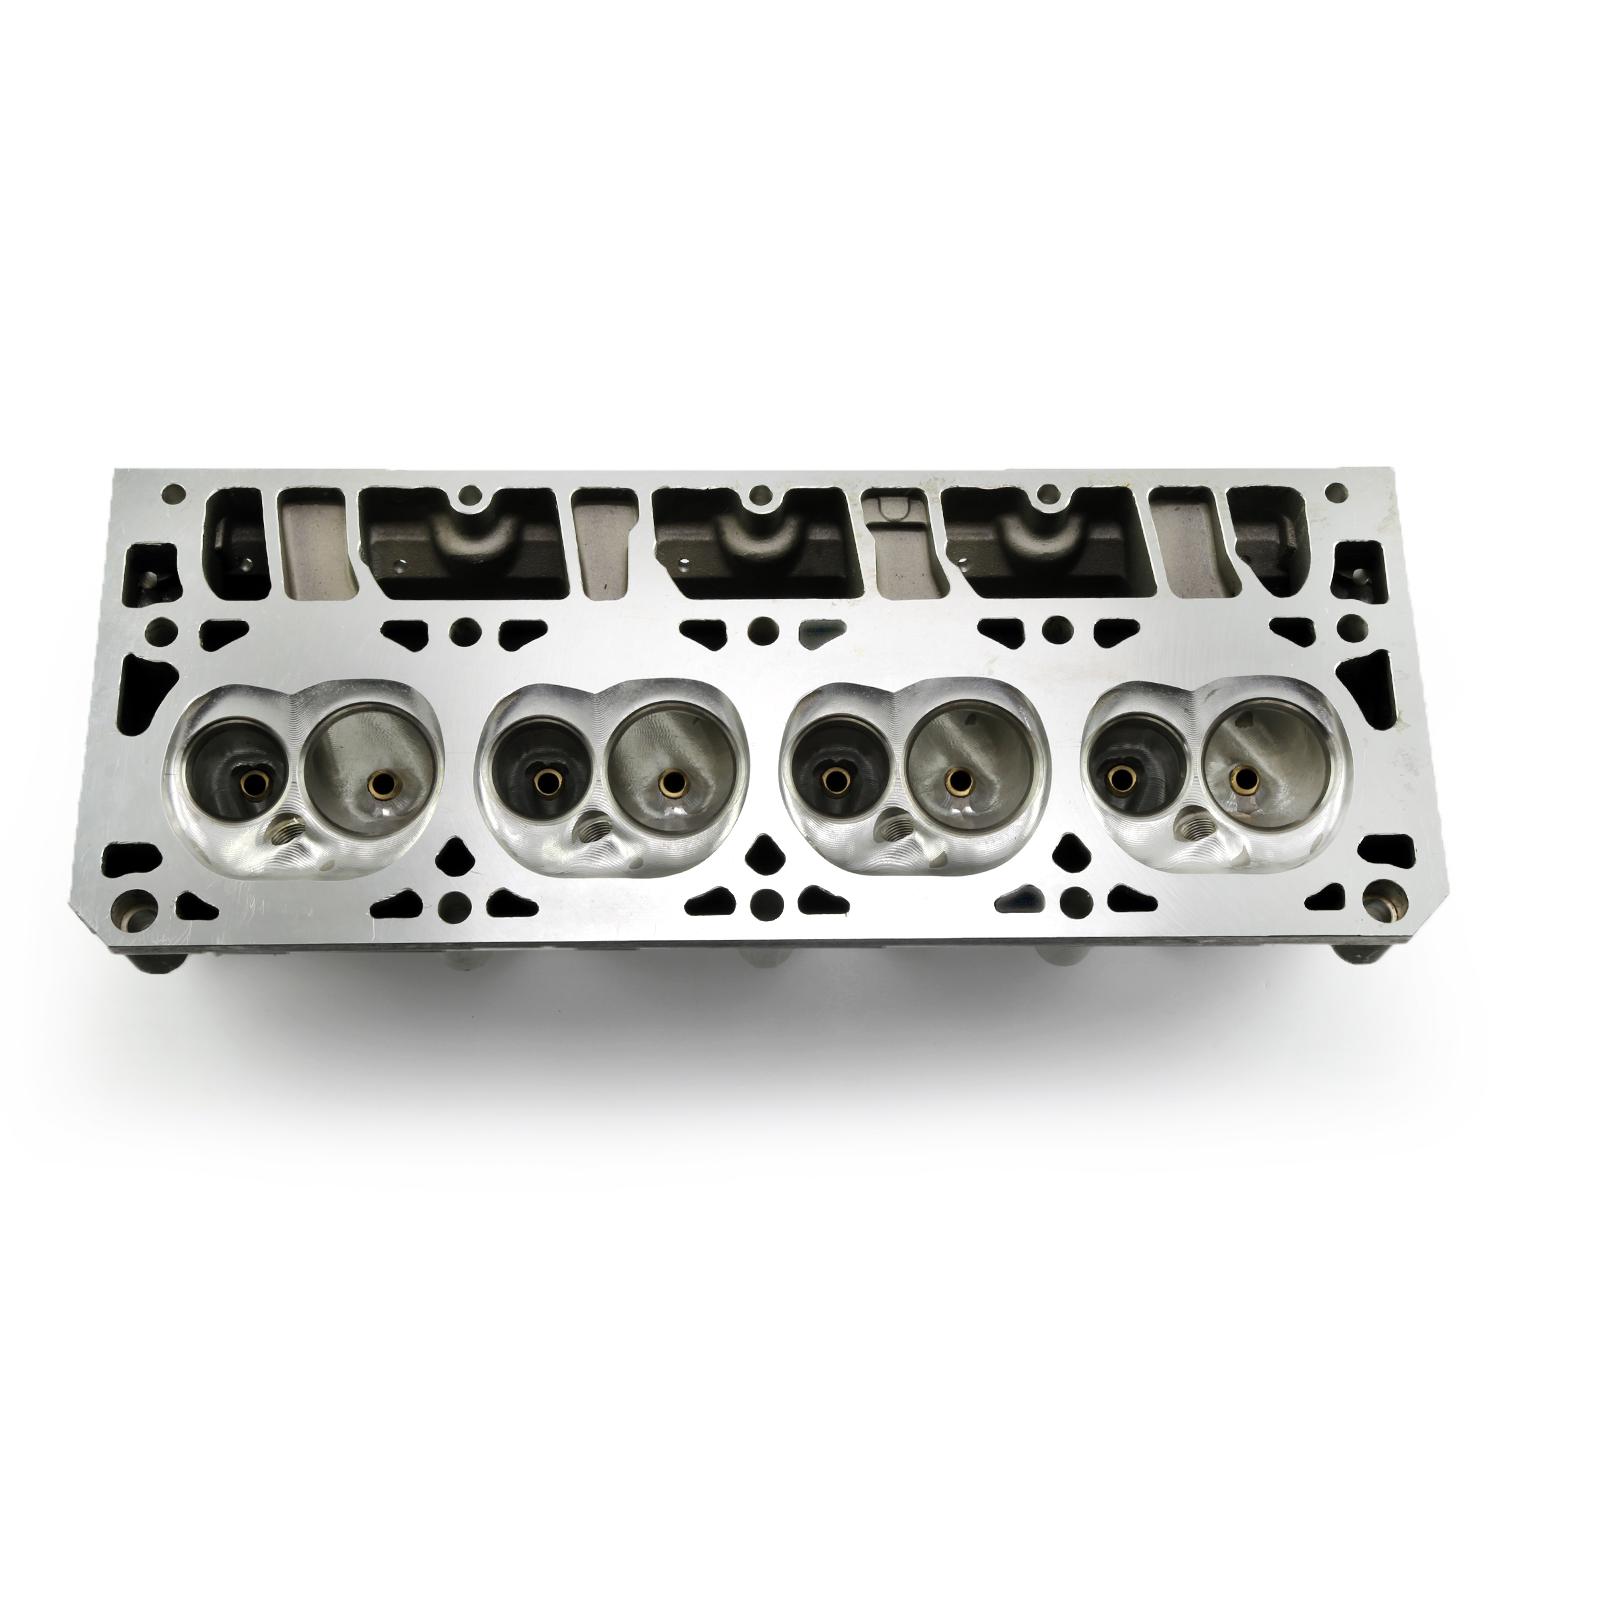 Speedmaster® PCE281.1088 Chevy GM LS1 LS6 198cc 68cc Full CNC Aluminum Bare Cylinder Head